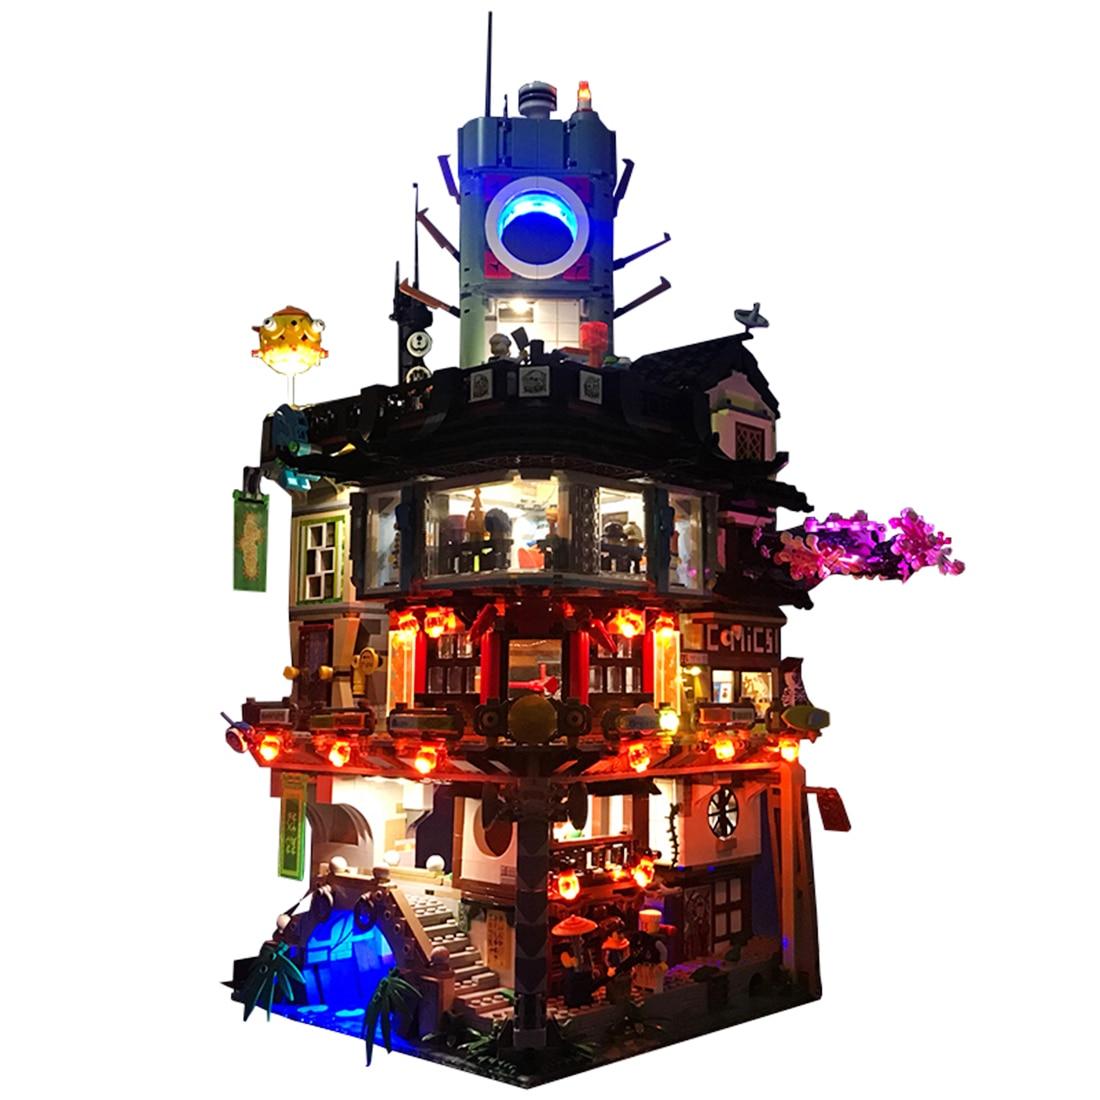 LED Light Building Block Brick DIY Kit For Le Go Ninjago City Master Of Spinjitzu 70620 Creative Gift For Children (Light Only)LED Light Building Block Brick DIY Kit For Le Go Ninjago City Master Of Spinjitzu 70620 Creative Gift For Children (Light Only)